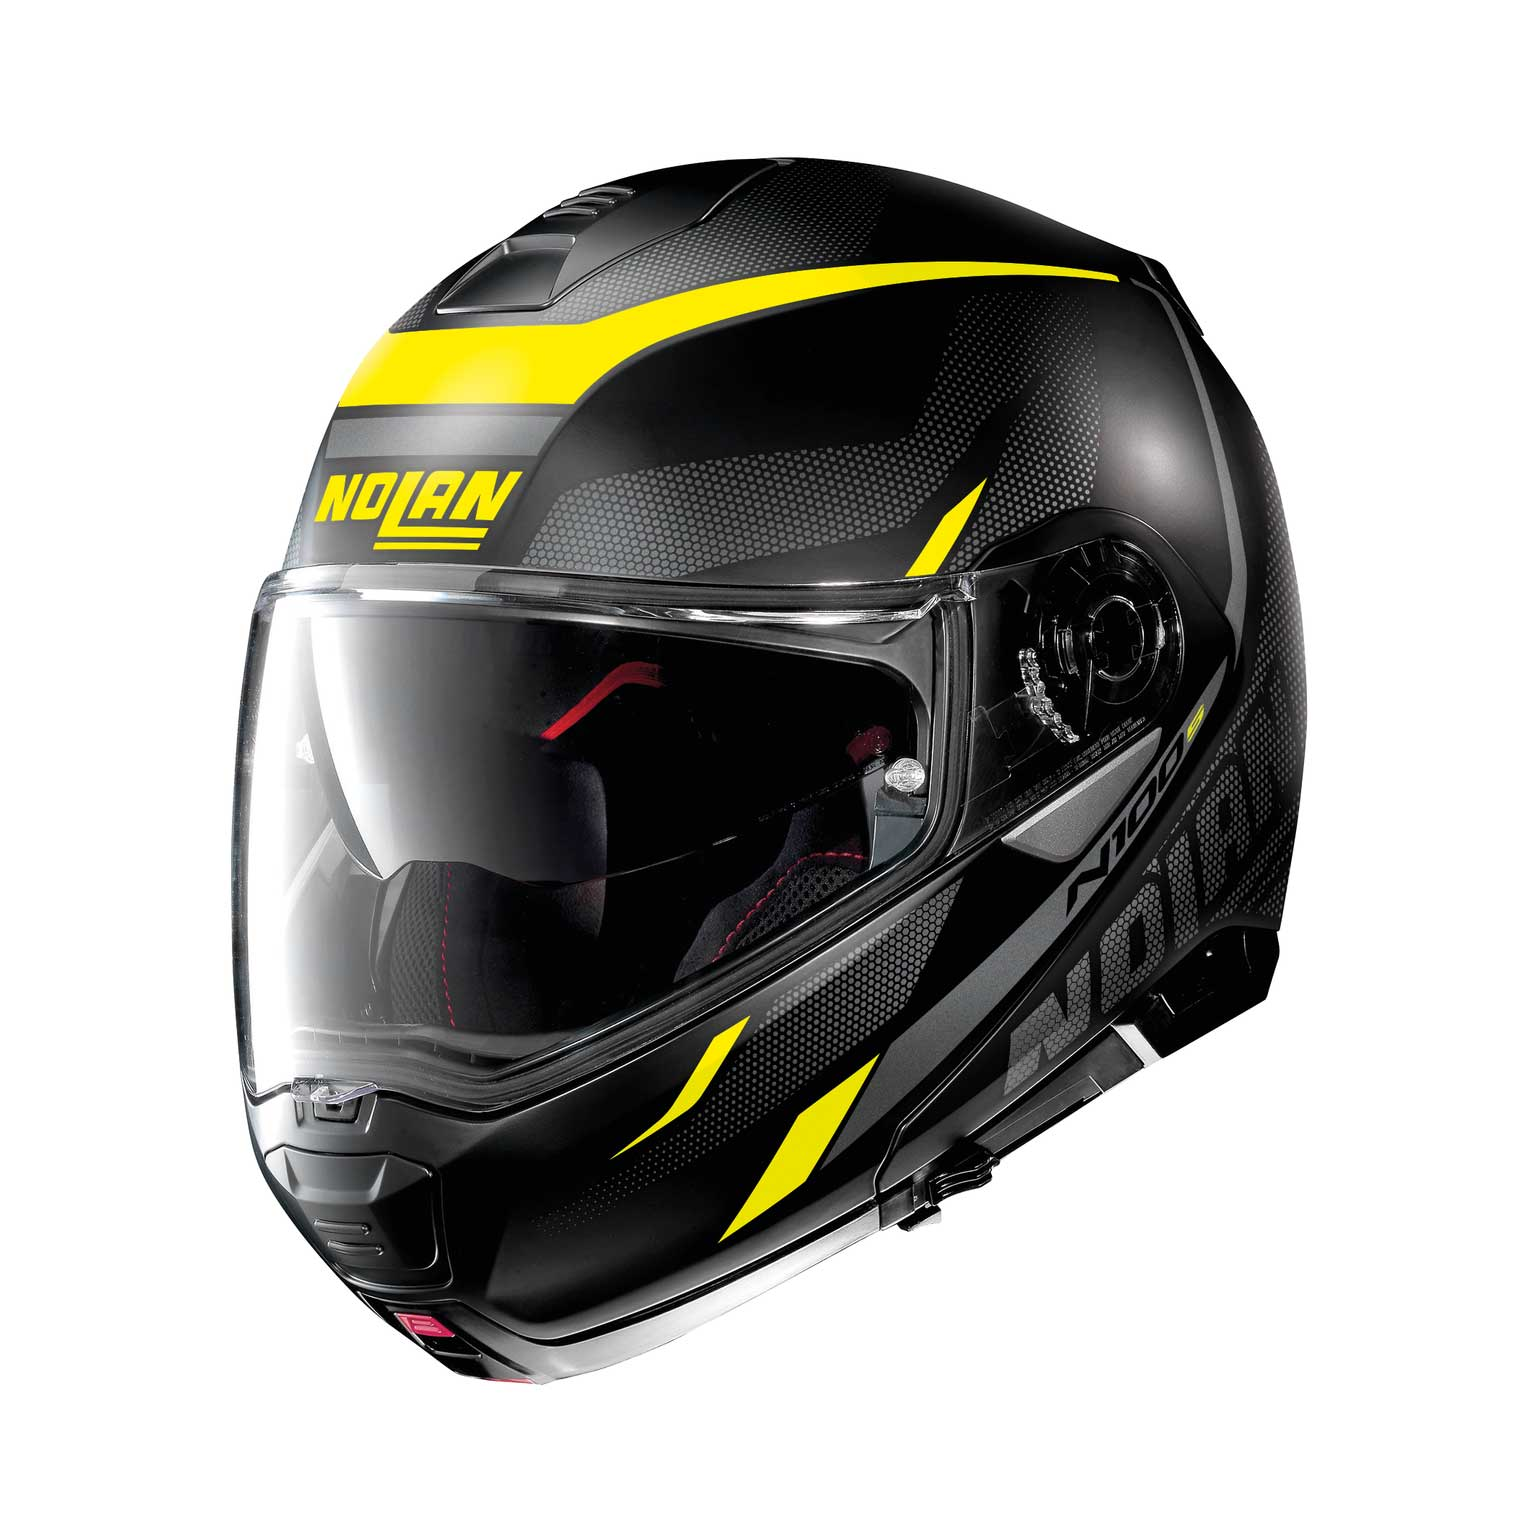 Nolan N100.5 Lumière N-Com Modularhelm gelb schwarz